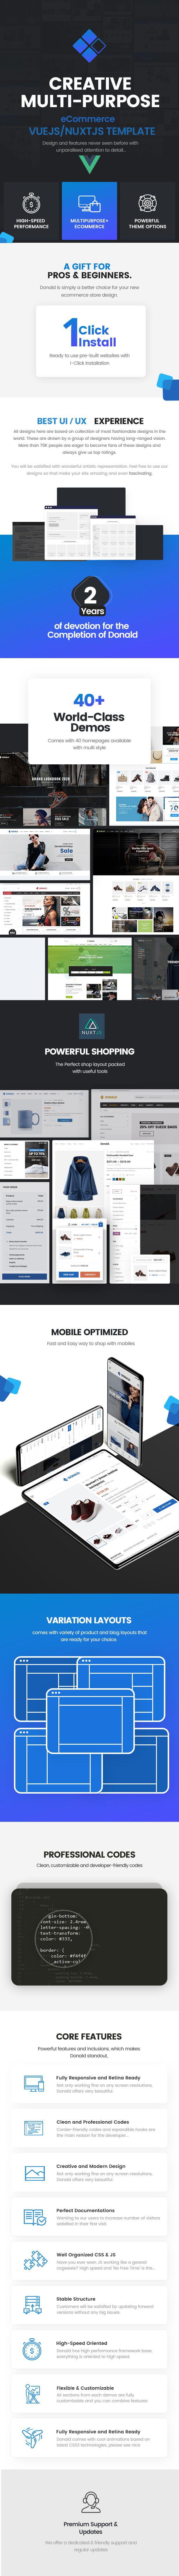 Riode - VueJS/NuxtJS Ultimate eCommerce Template - 1